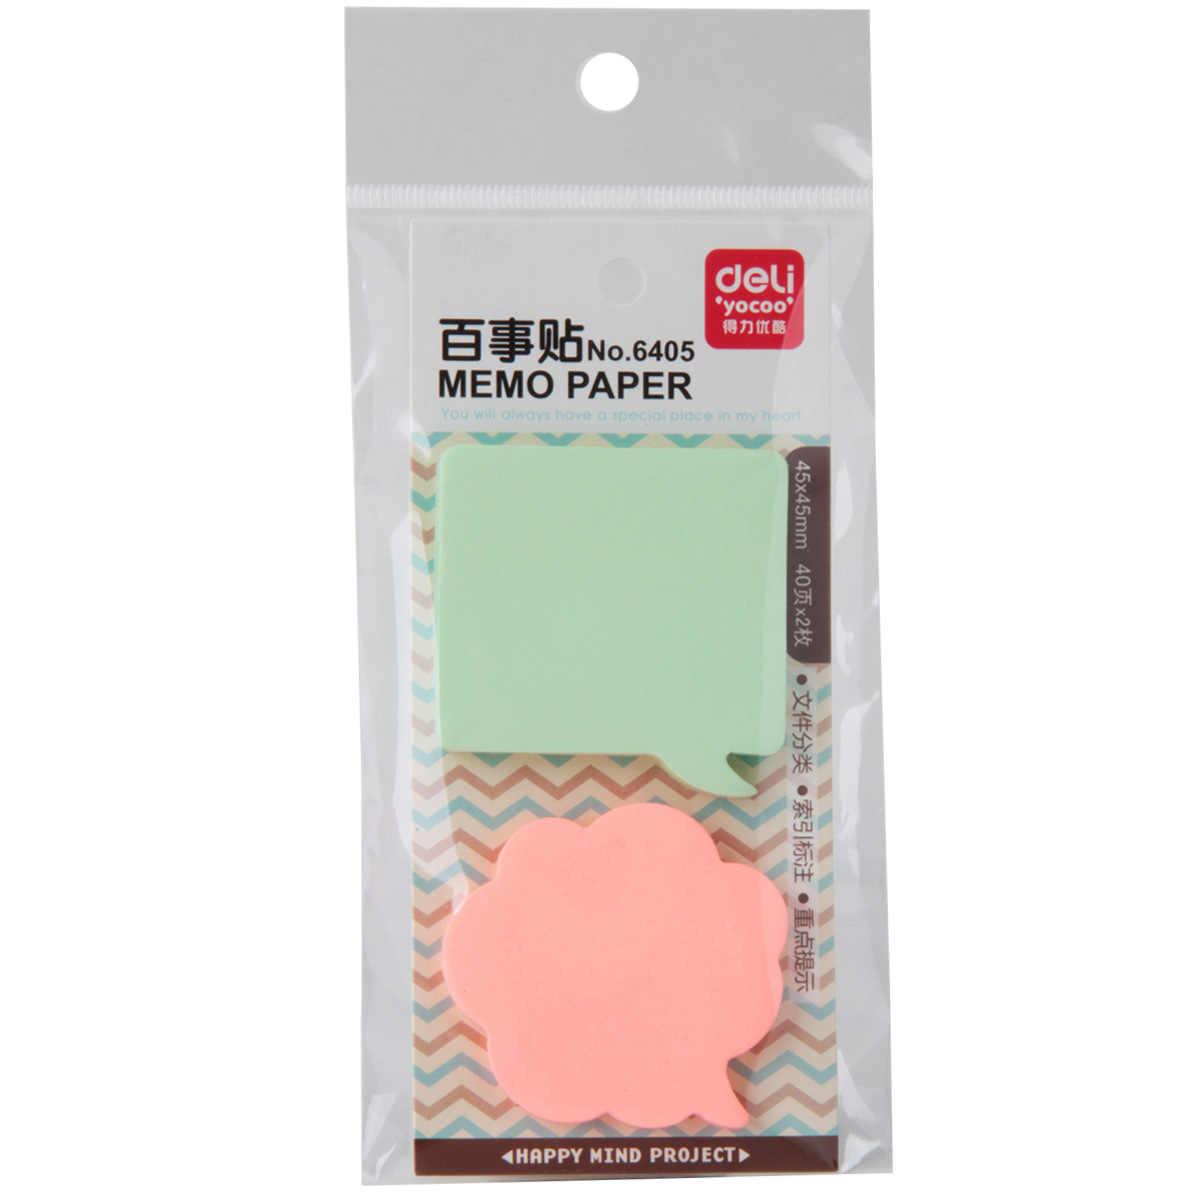 80 листов корейский заметки Творческий блокнот для заметок Filofax блокноты для записей офиса школа Канцелярские царапин